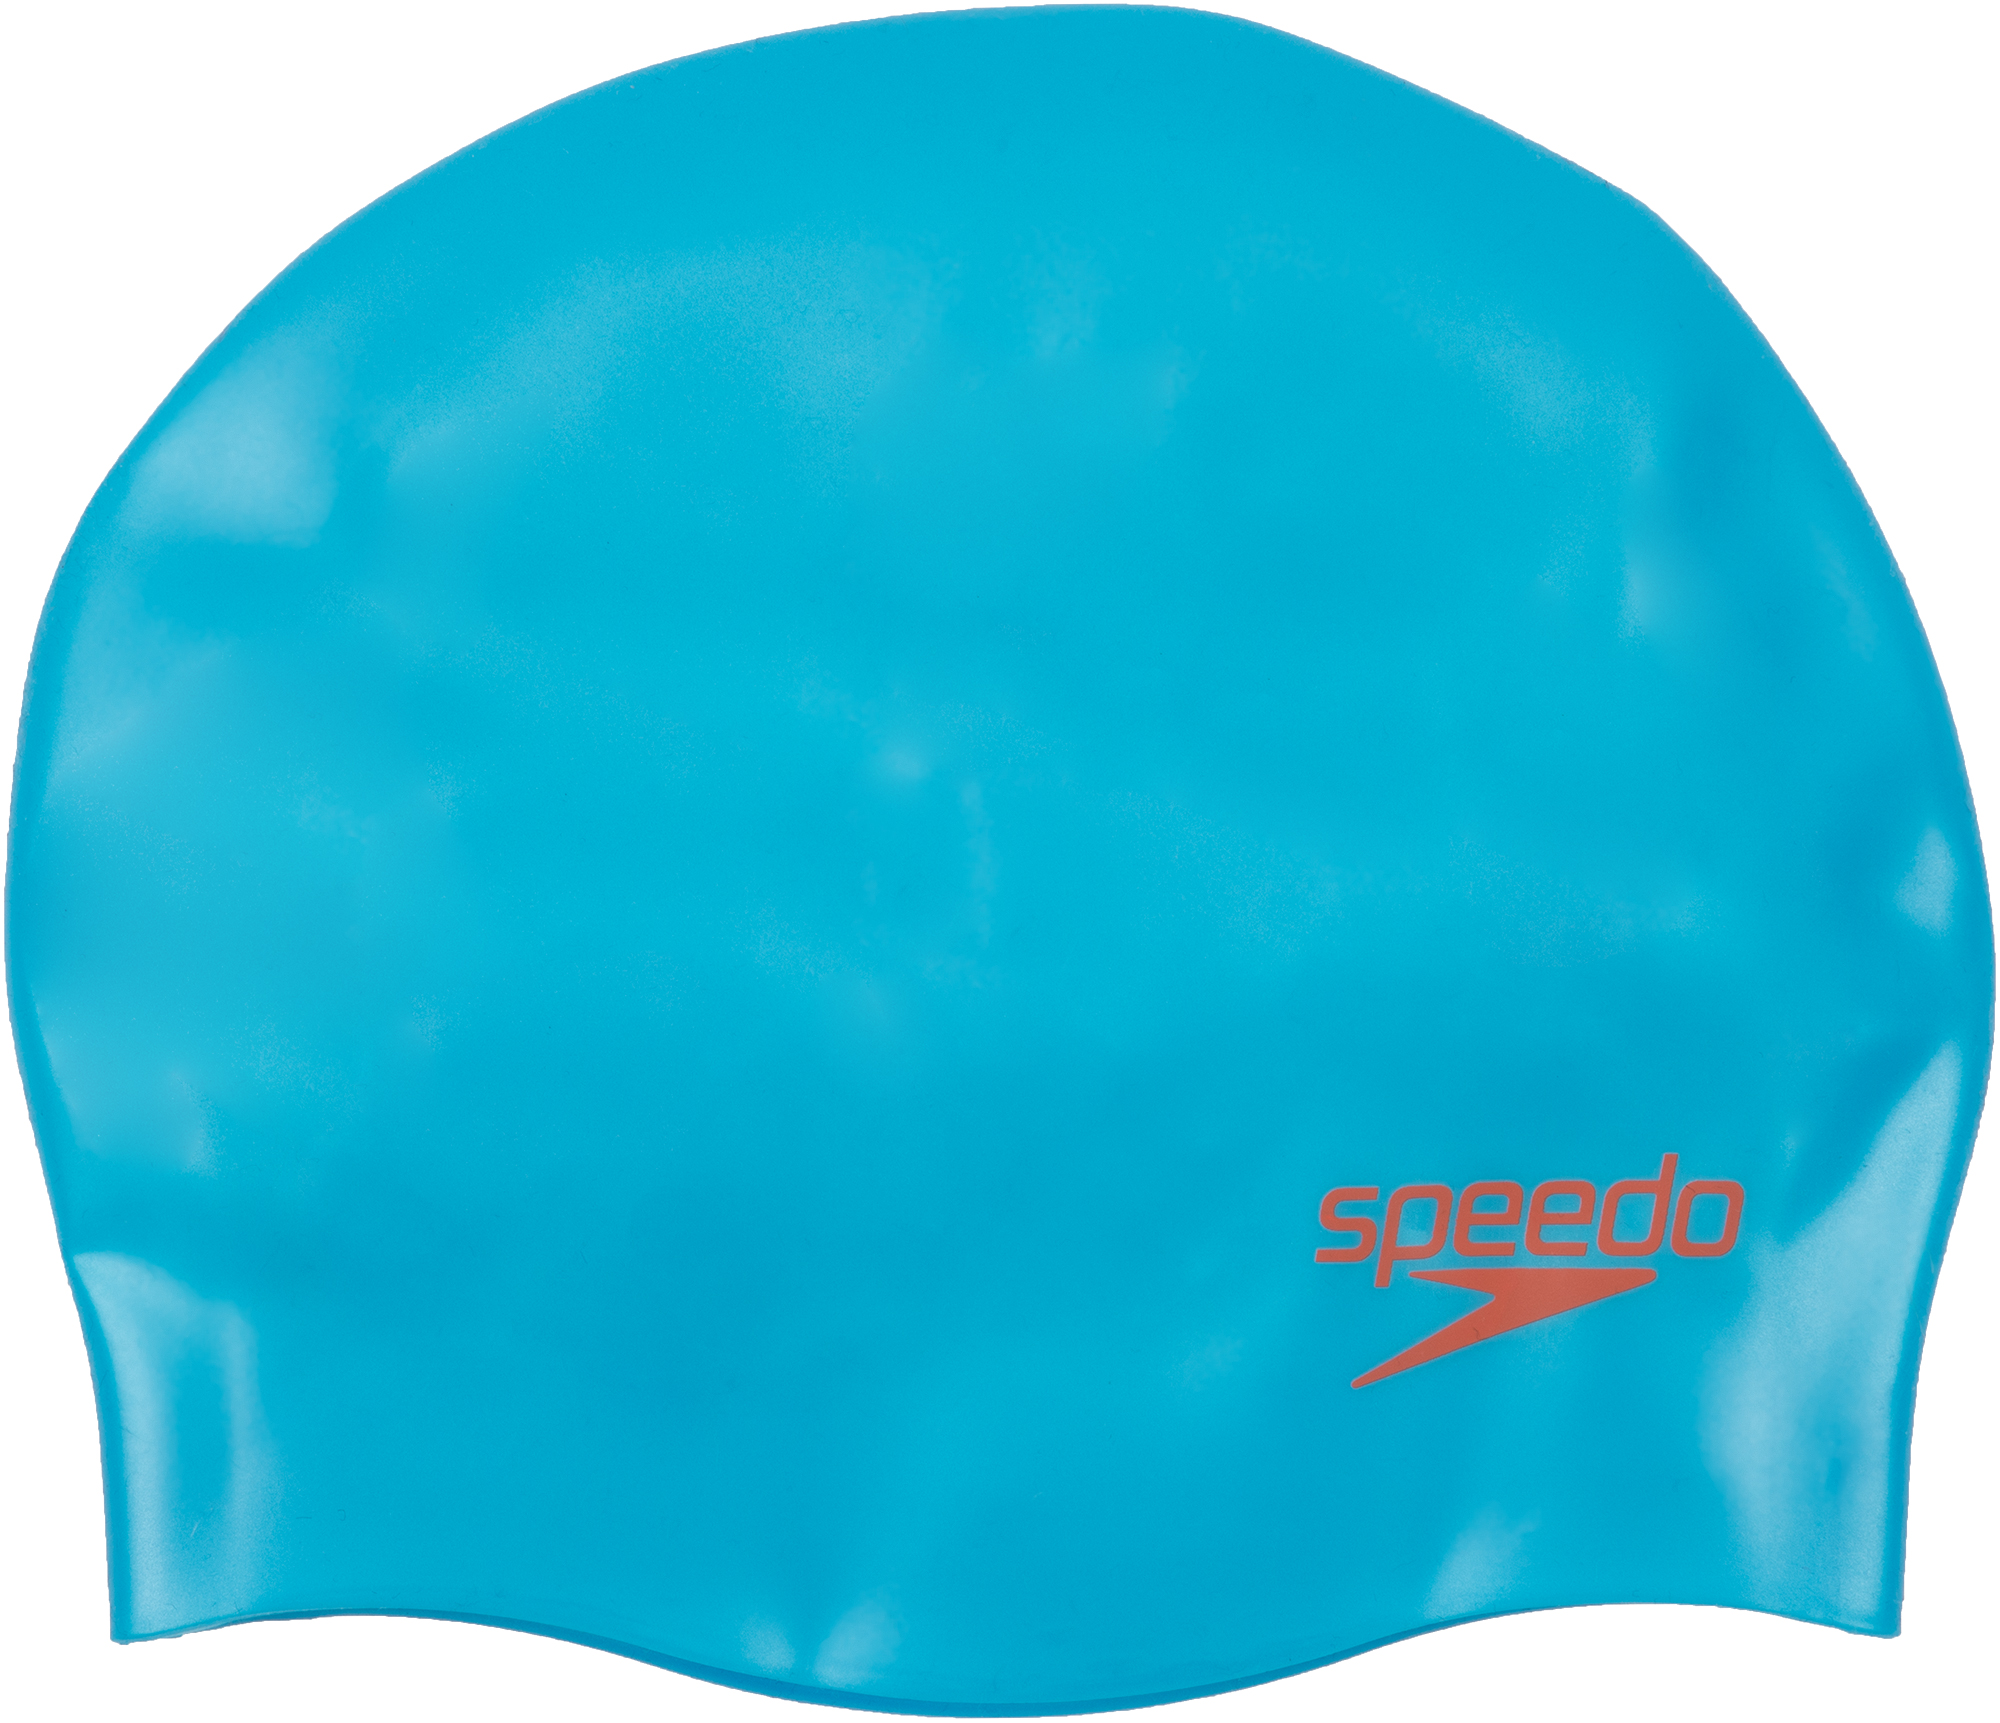 Speedo Шапочка для плавания детская Speedo Plain Moulded, размер Без размера все цены